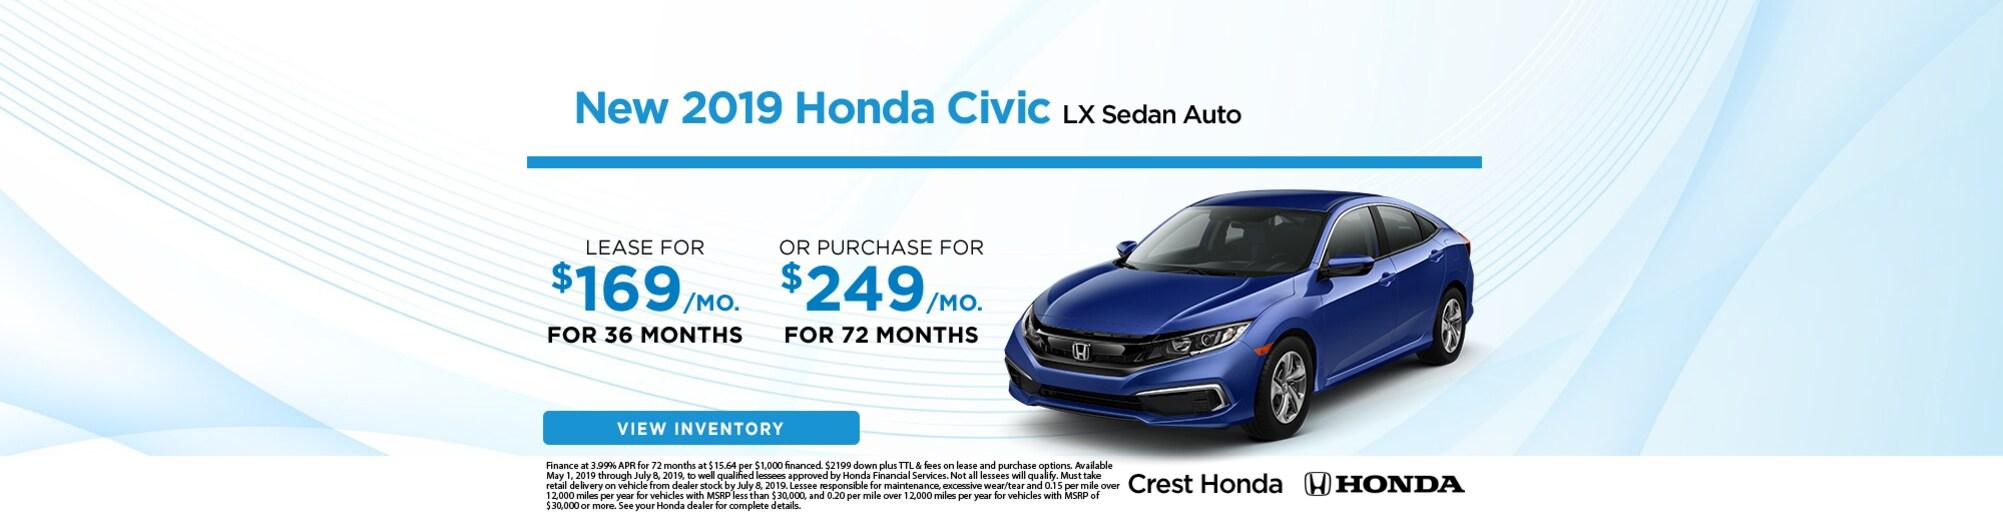 Crest Honda Nashville >> Crest Honda | New & Used Honda Dealer Serving Nashville, TN